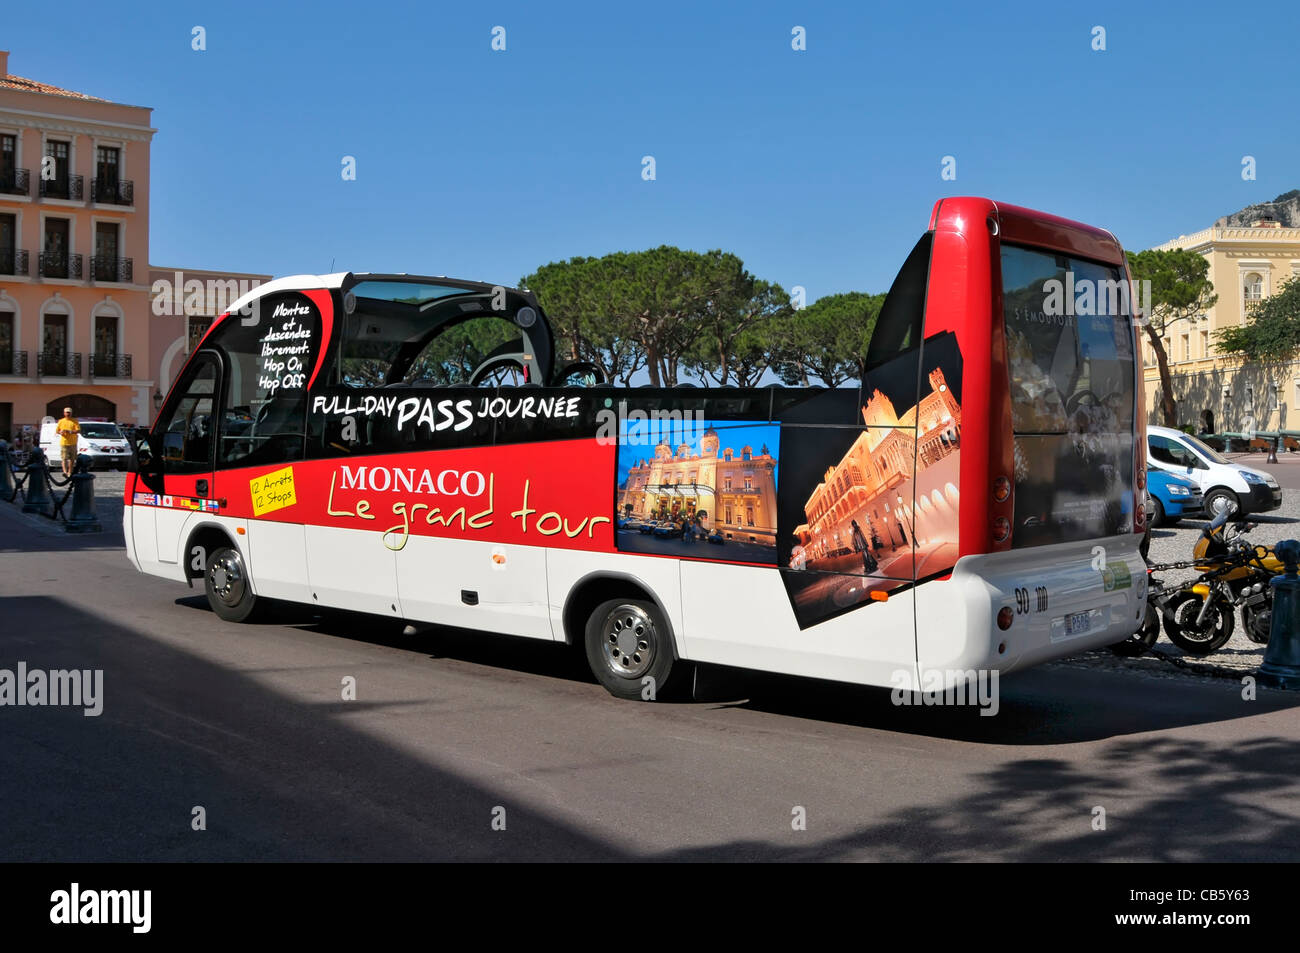 Tour Bus Monte Carlo Monaco Principality French Riviera Mediterranean Cote d'Azur Alps Stock Photo